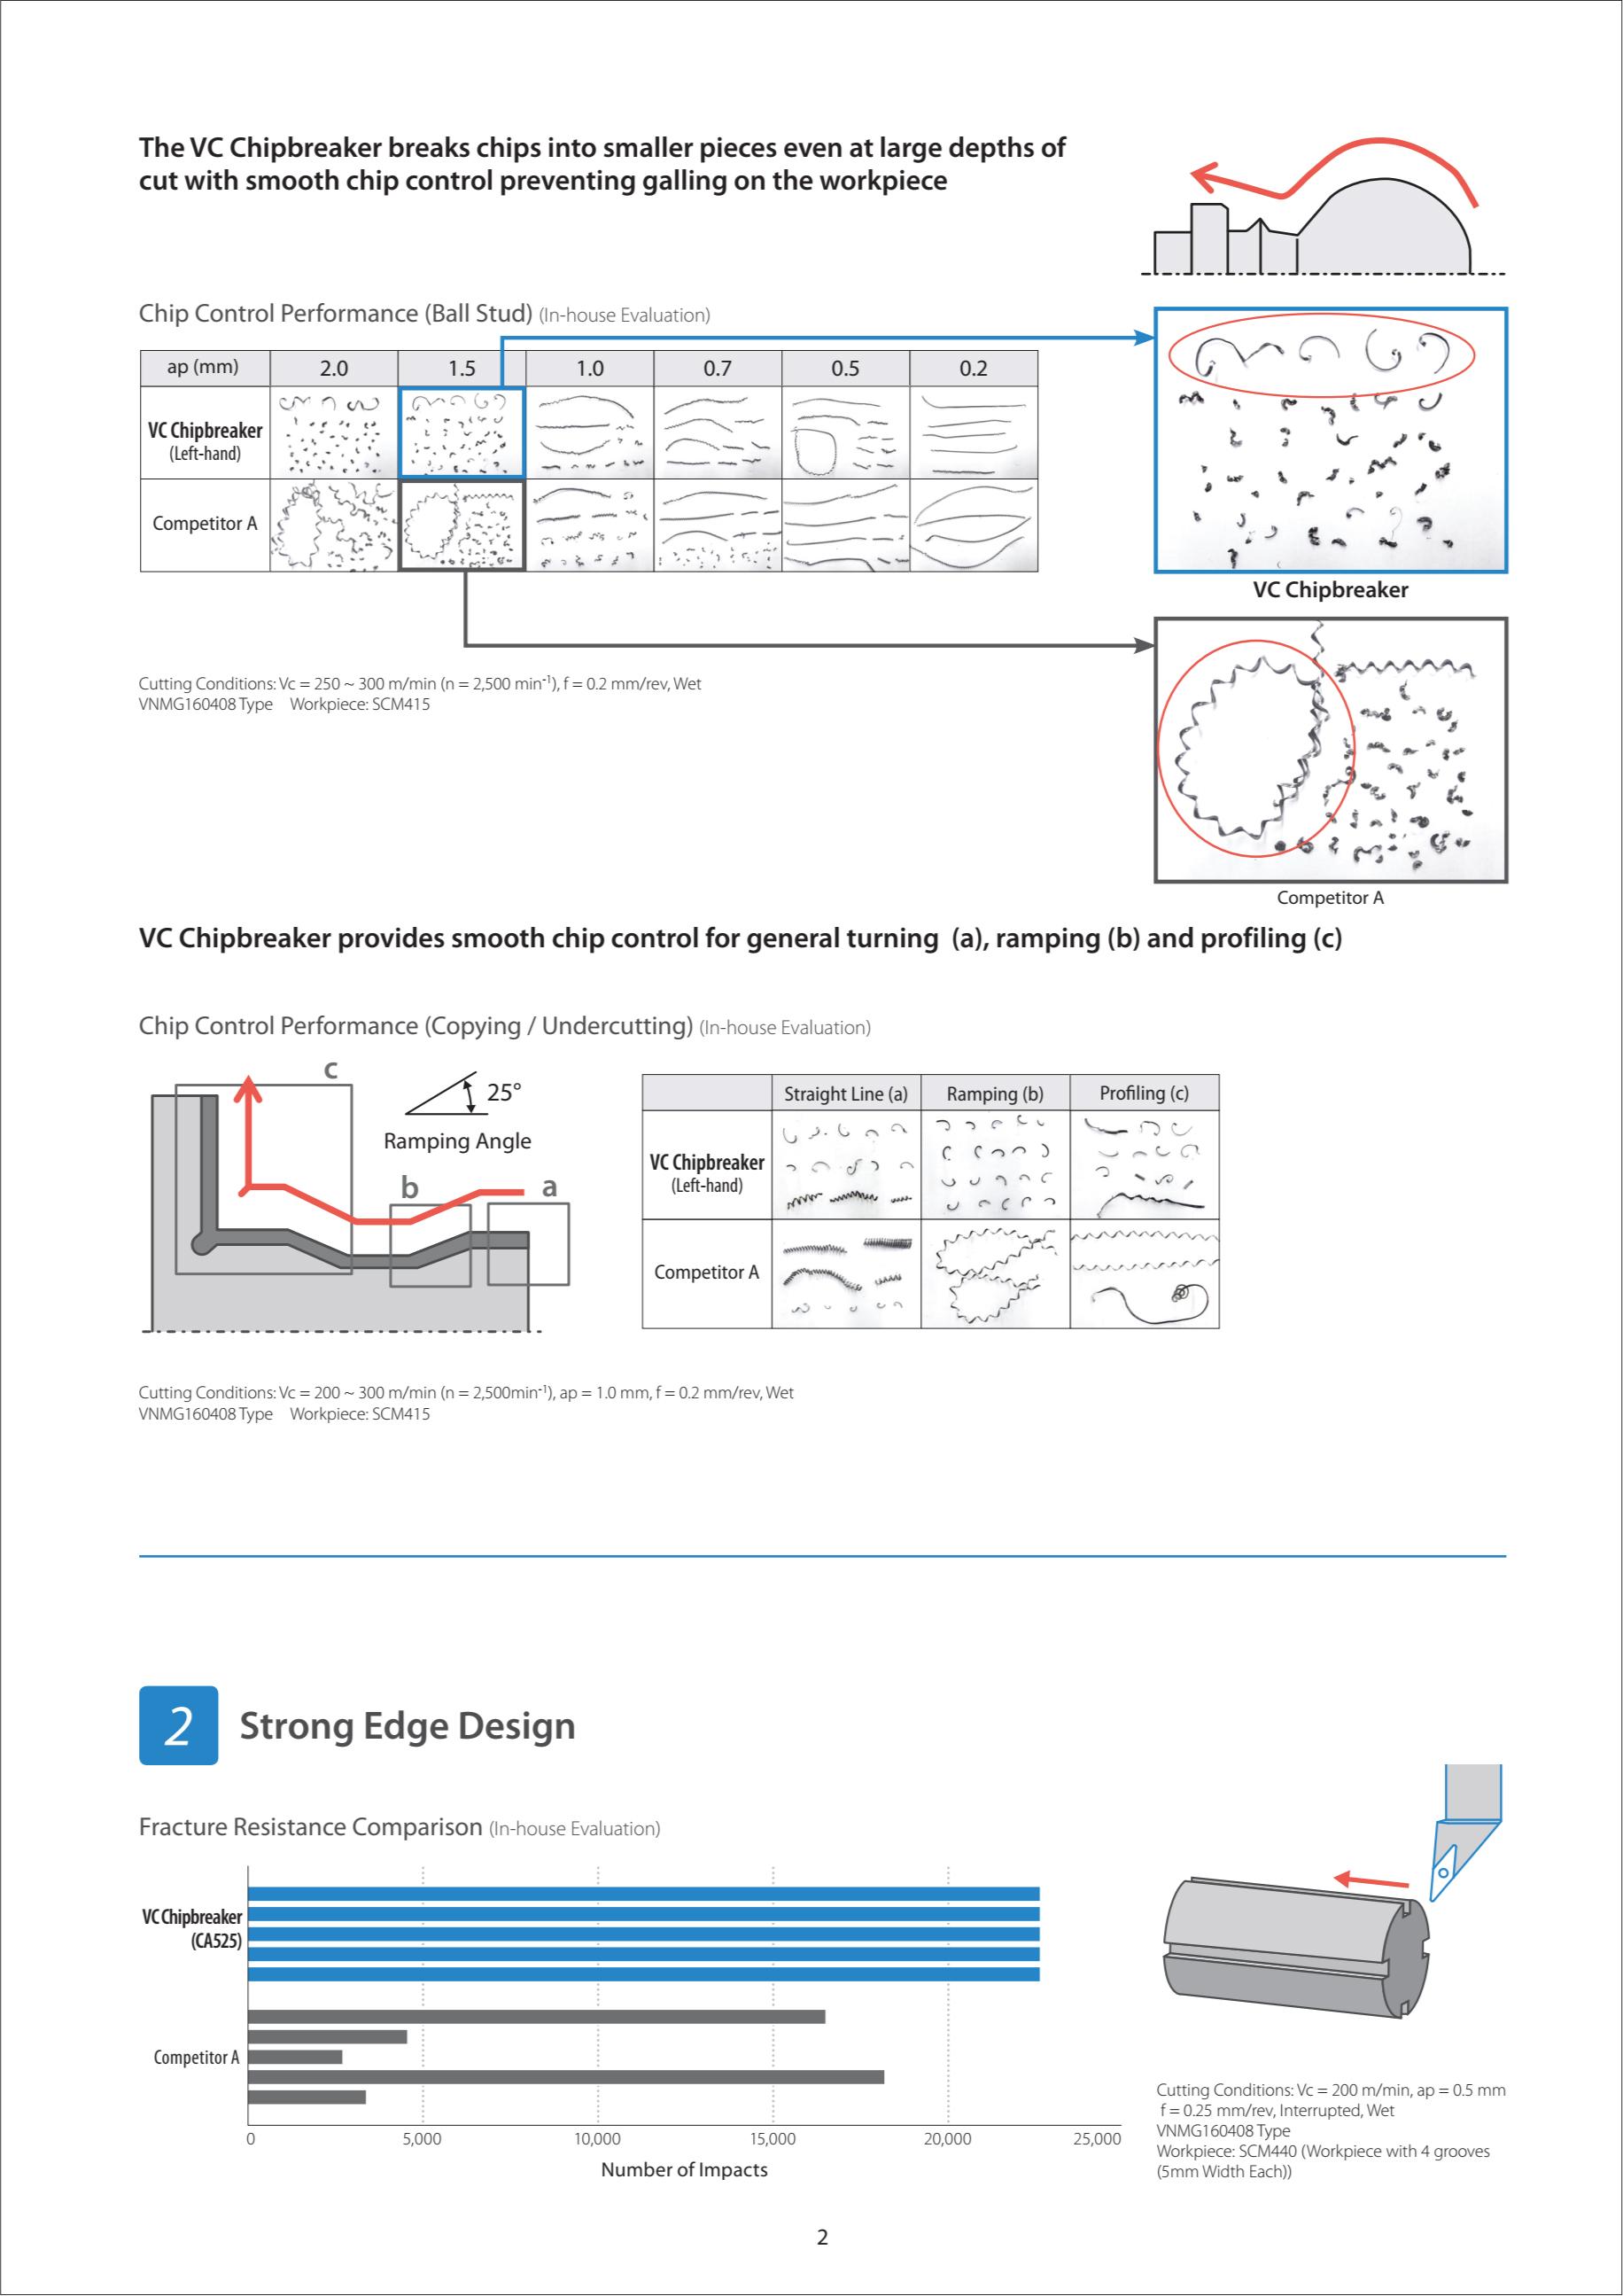 Mảnh Dao Tiện Copying Kyocera VNMG1604 VC Chipbreaker 4